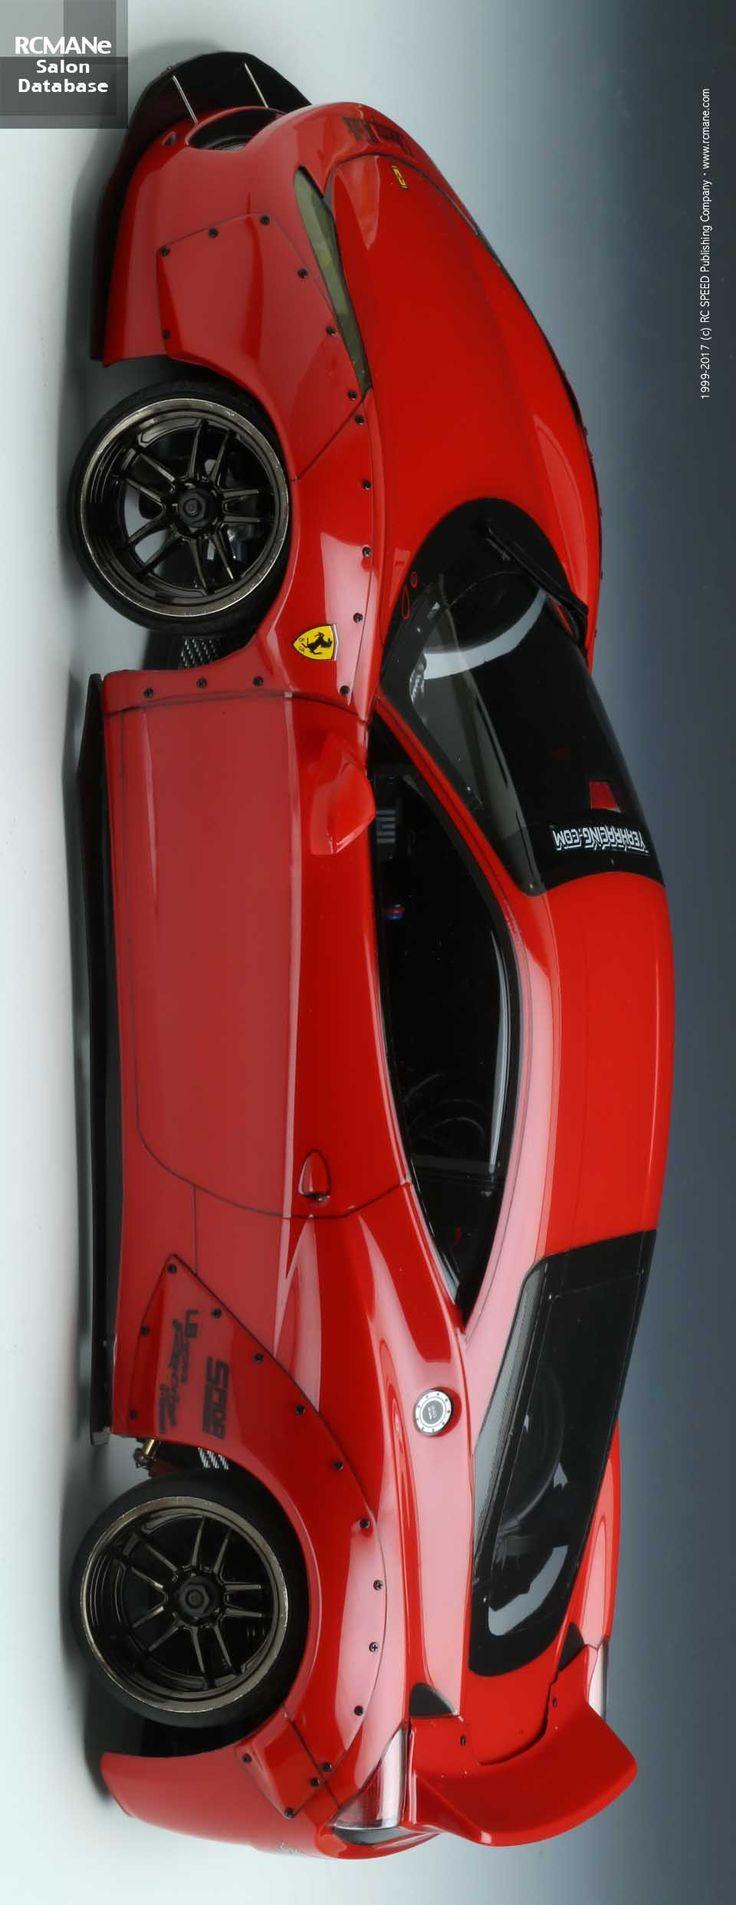 SA080_R31 House GRK Global plus GRK R2kaiSV RWD kit(2016)/ SFIDA body kit LB458 1/10 EP Drift Car Rear-driven RWD, with Tamiya Ferrari 458 Body Set Item no. 51526, Supplier by: rcMart